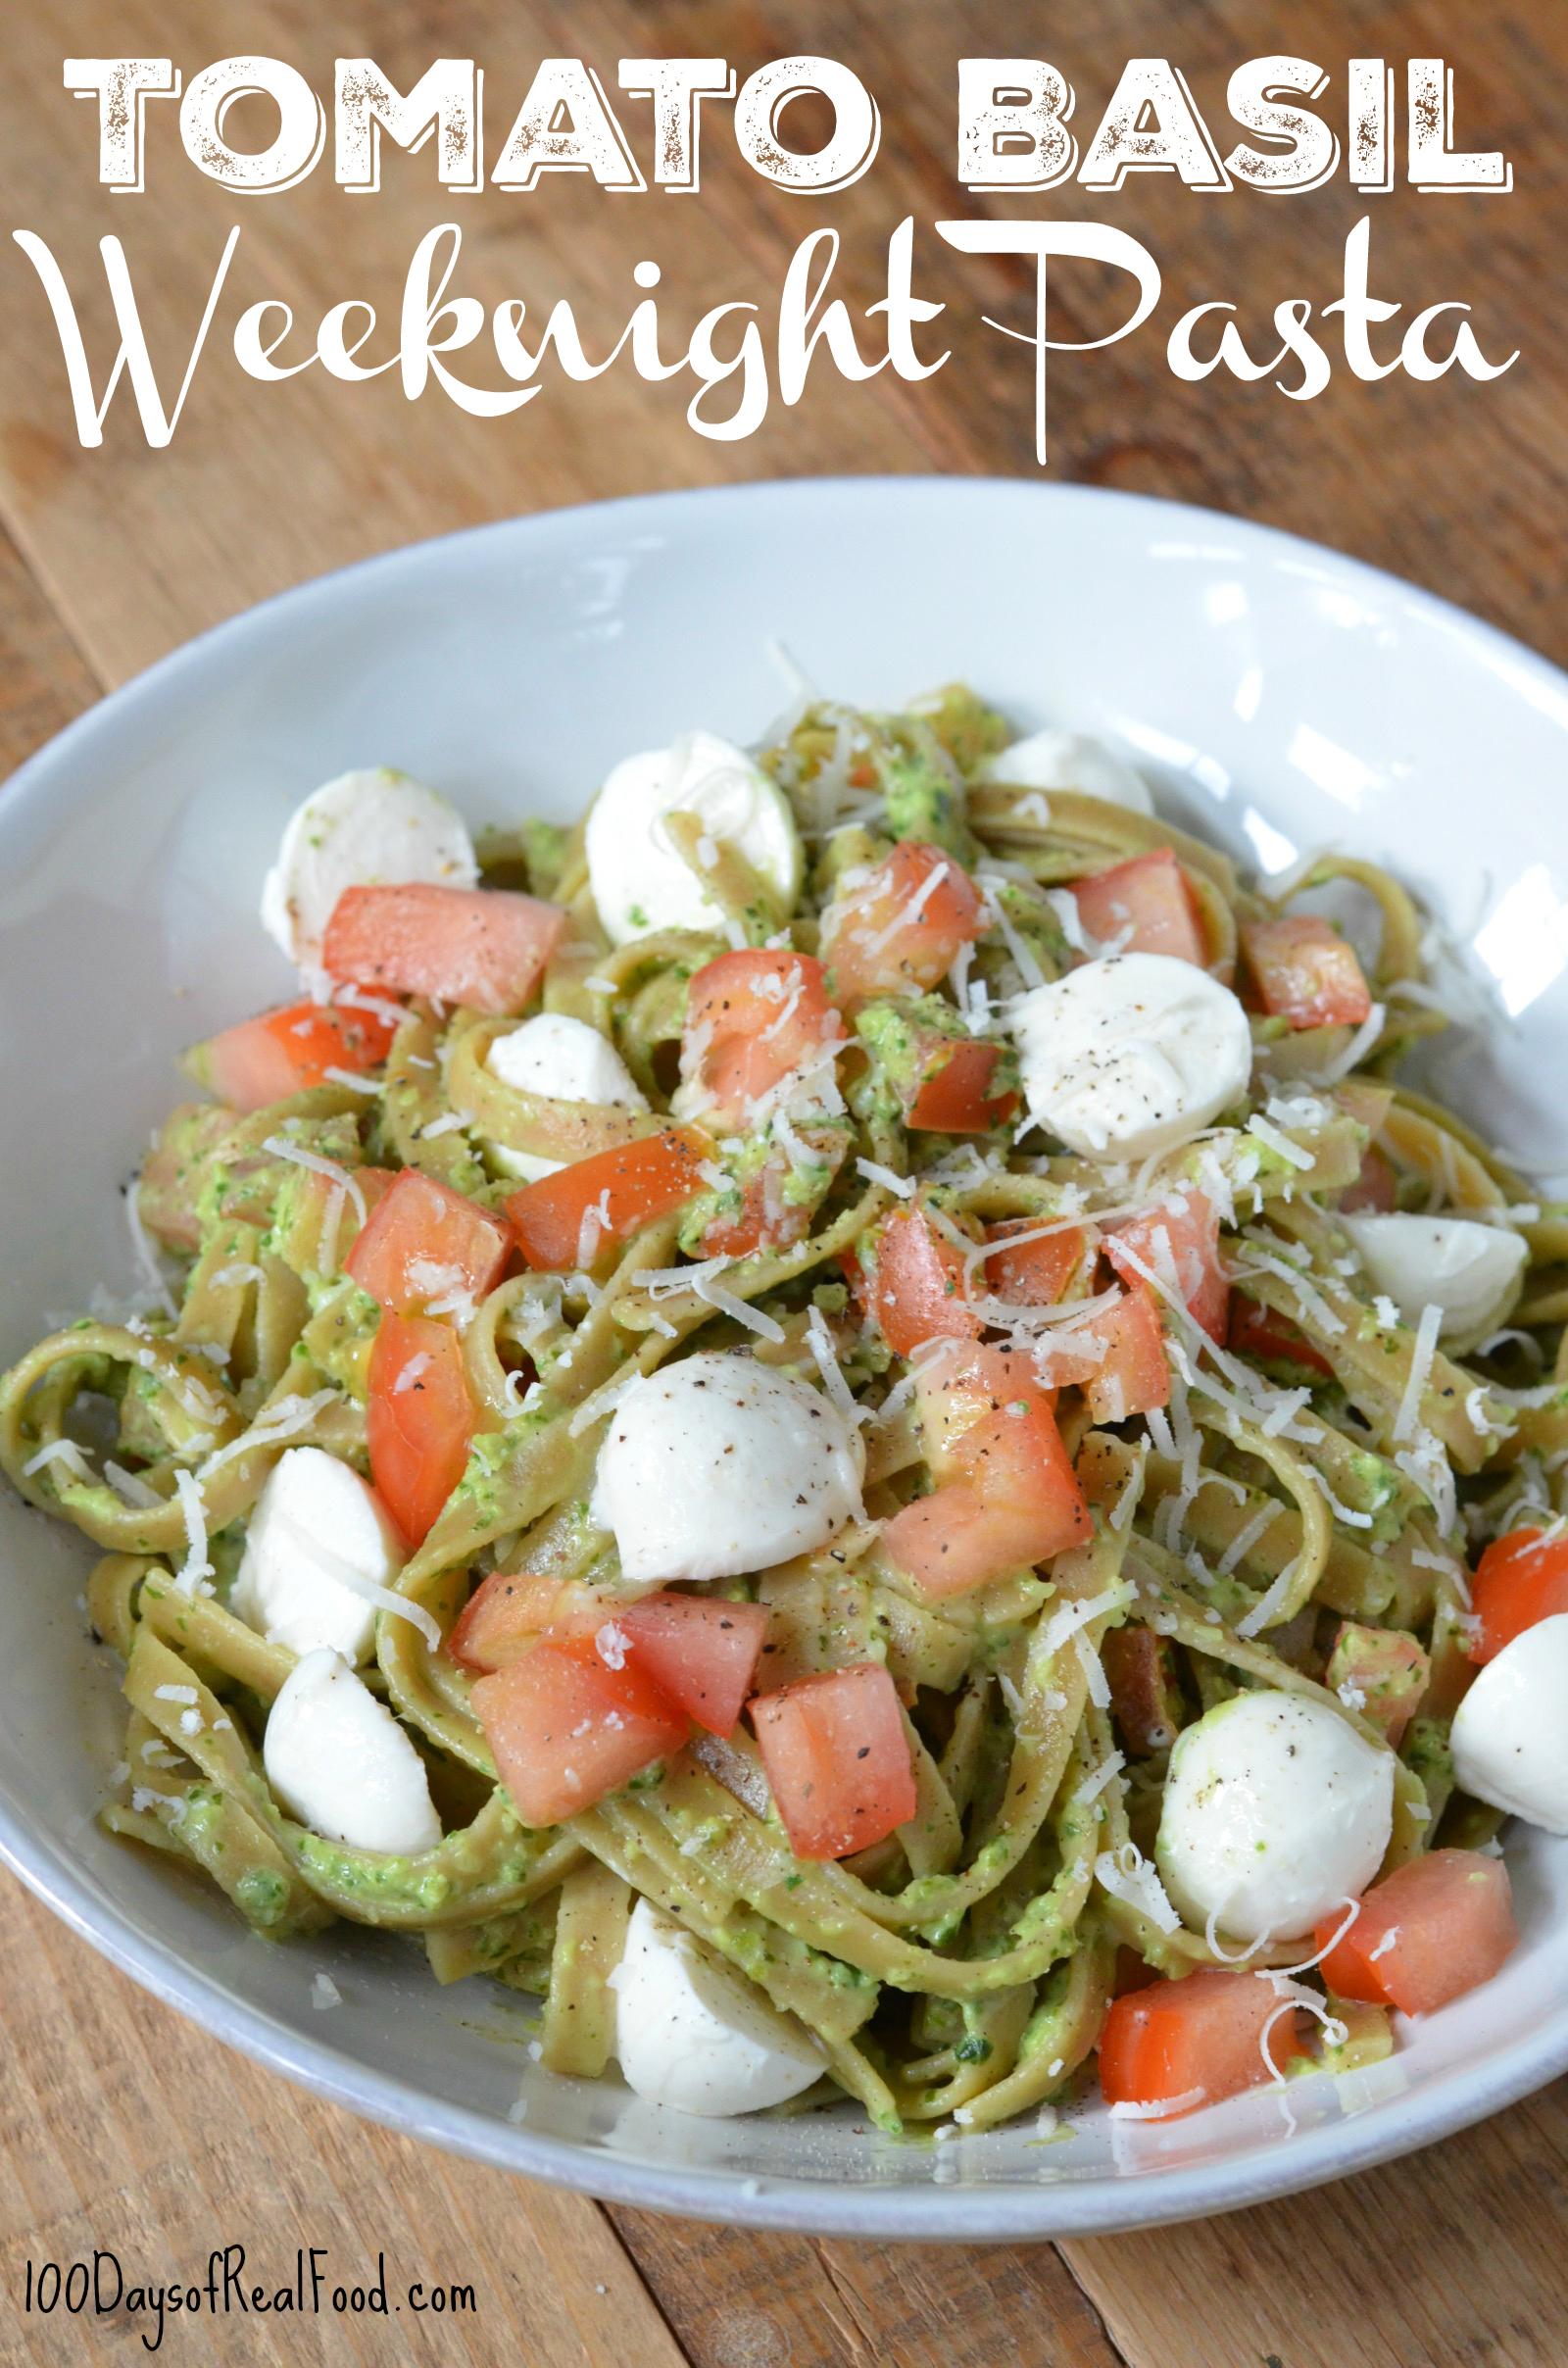 Tomato Basil Weeknight Pasta  in white bowl